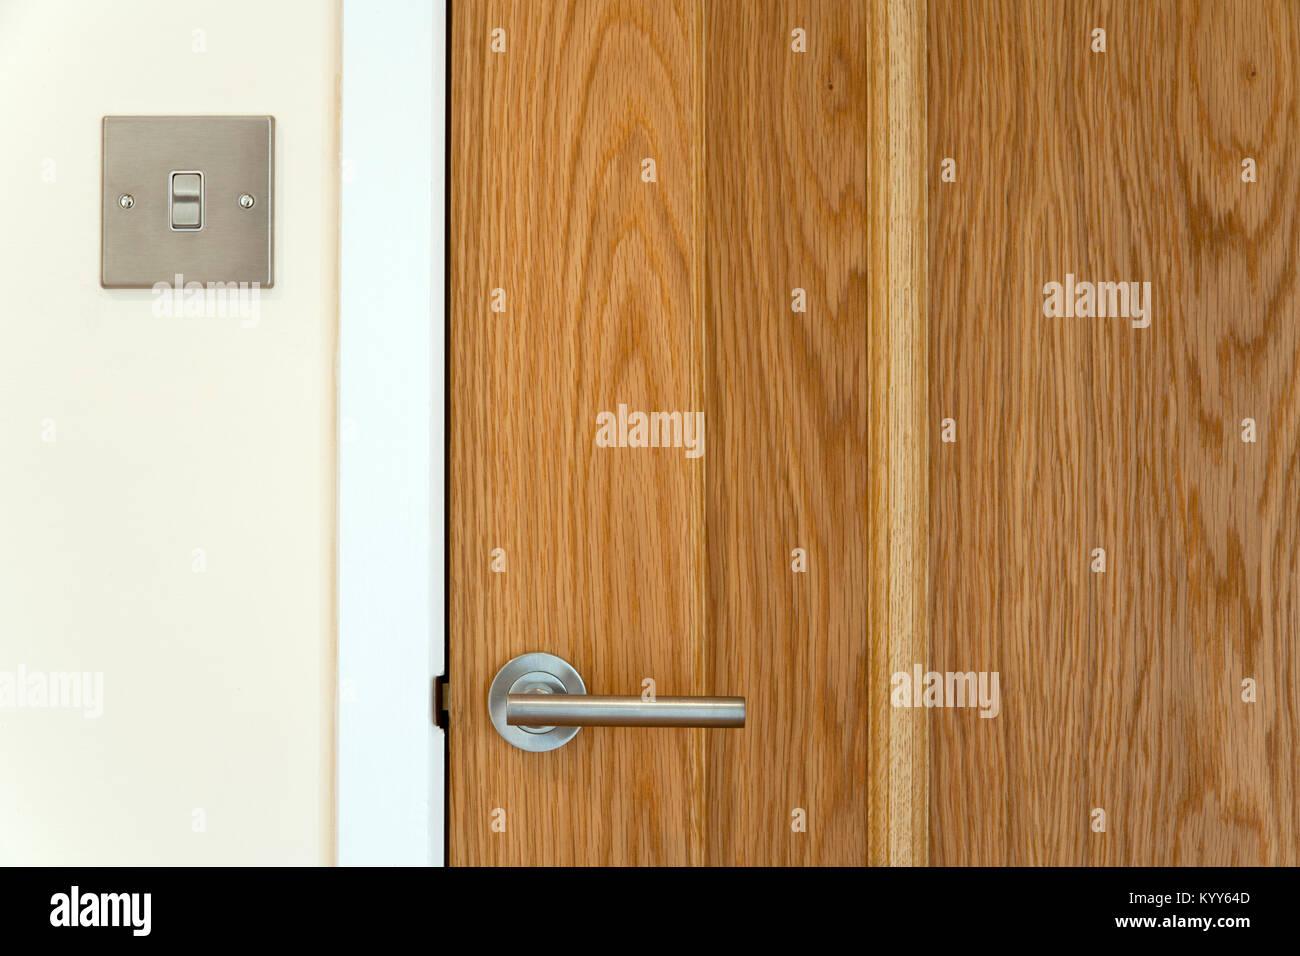 Contemporary Door Handle On A Closed Solid Wood Interior Door Stock